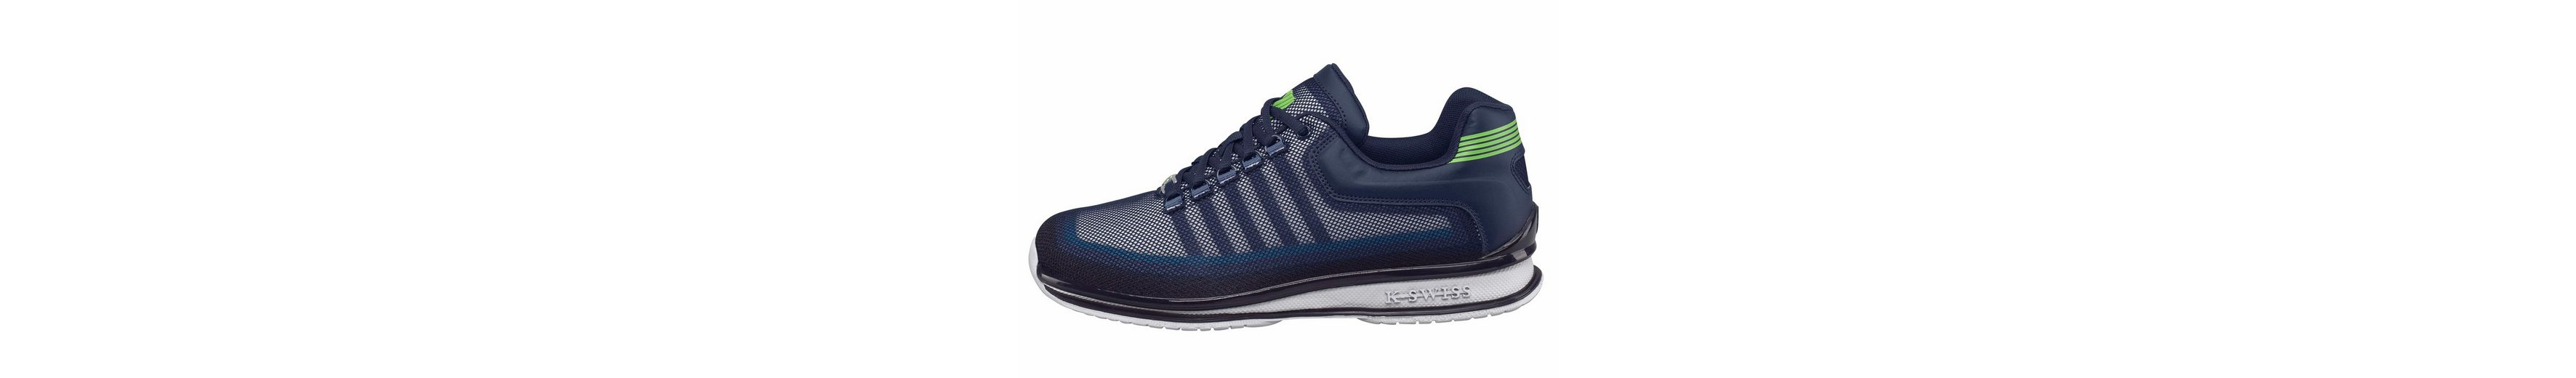 Billig Verkauf Große Diskont K-Swiss Rinzler Trainer Sneaker Verkauf Finish QaOlP97